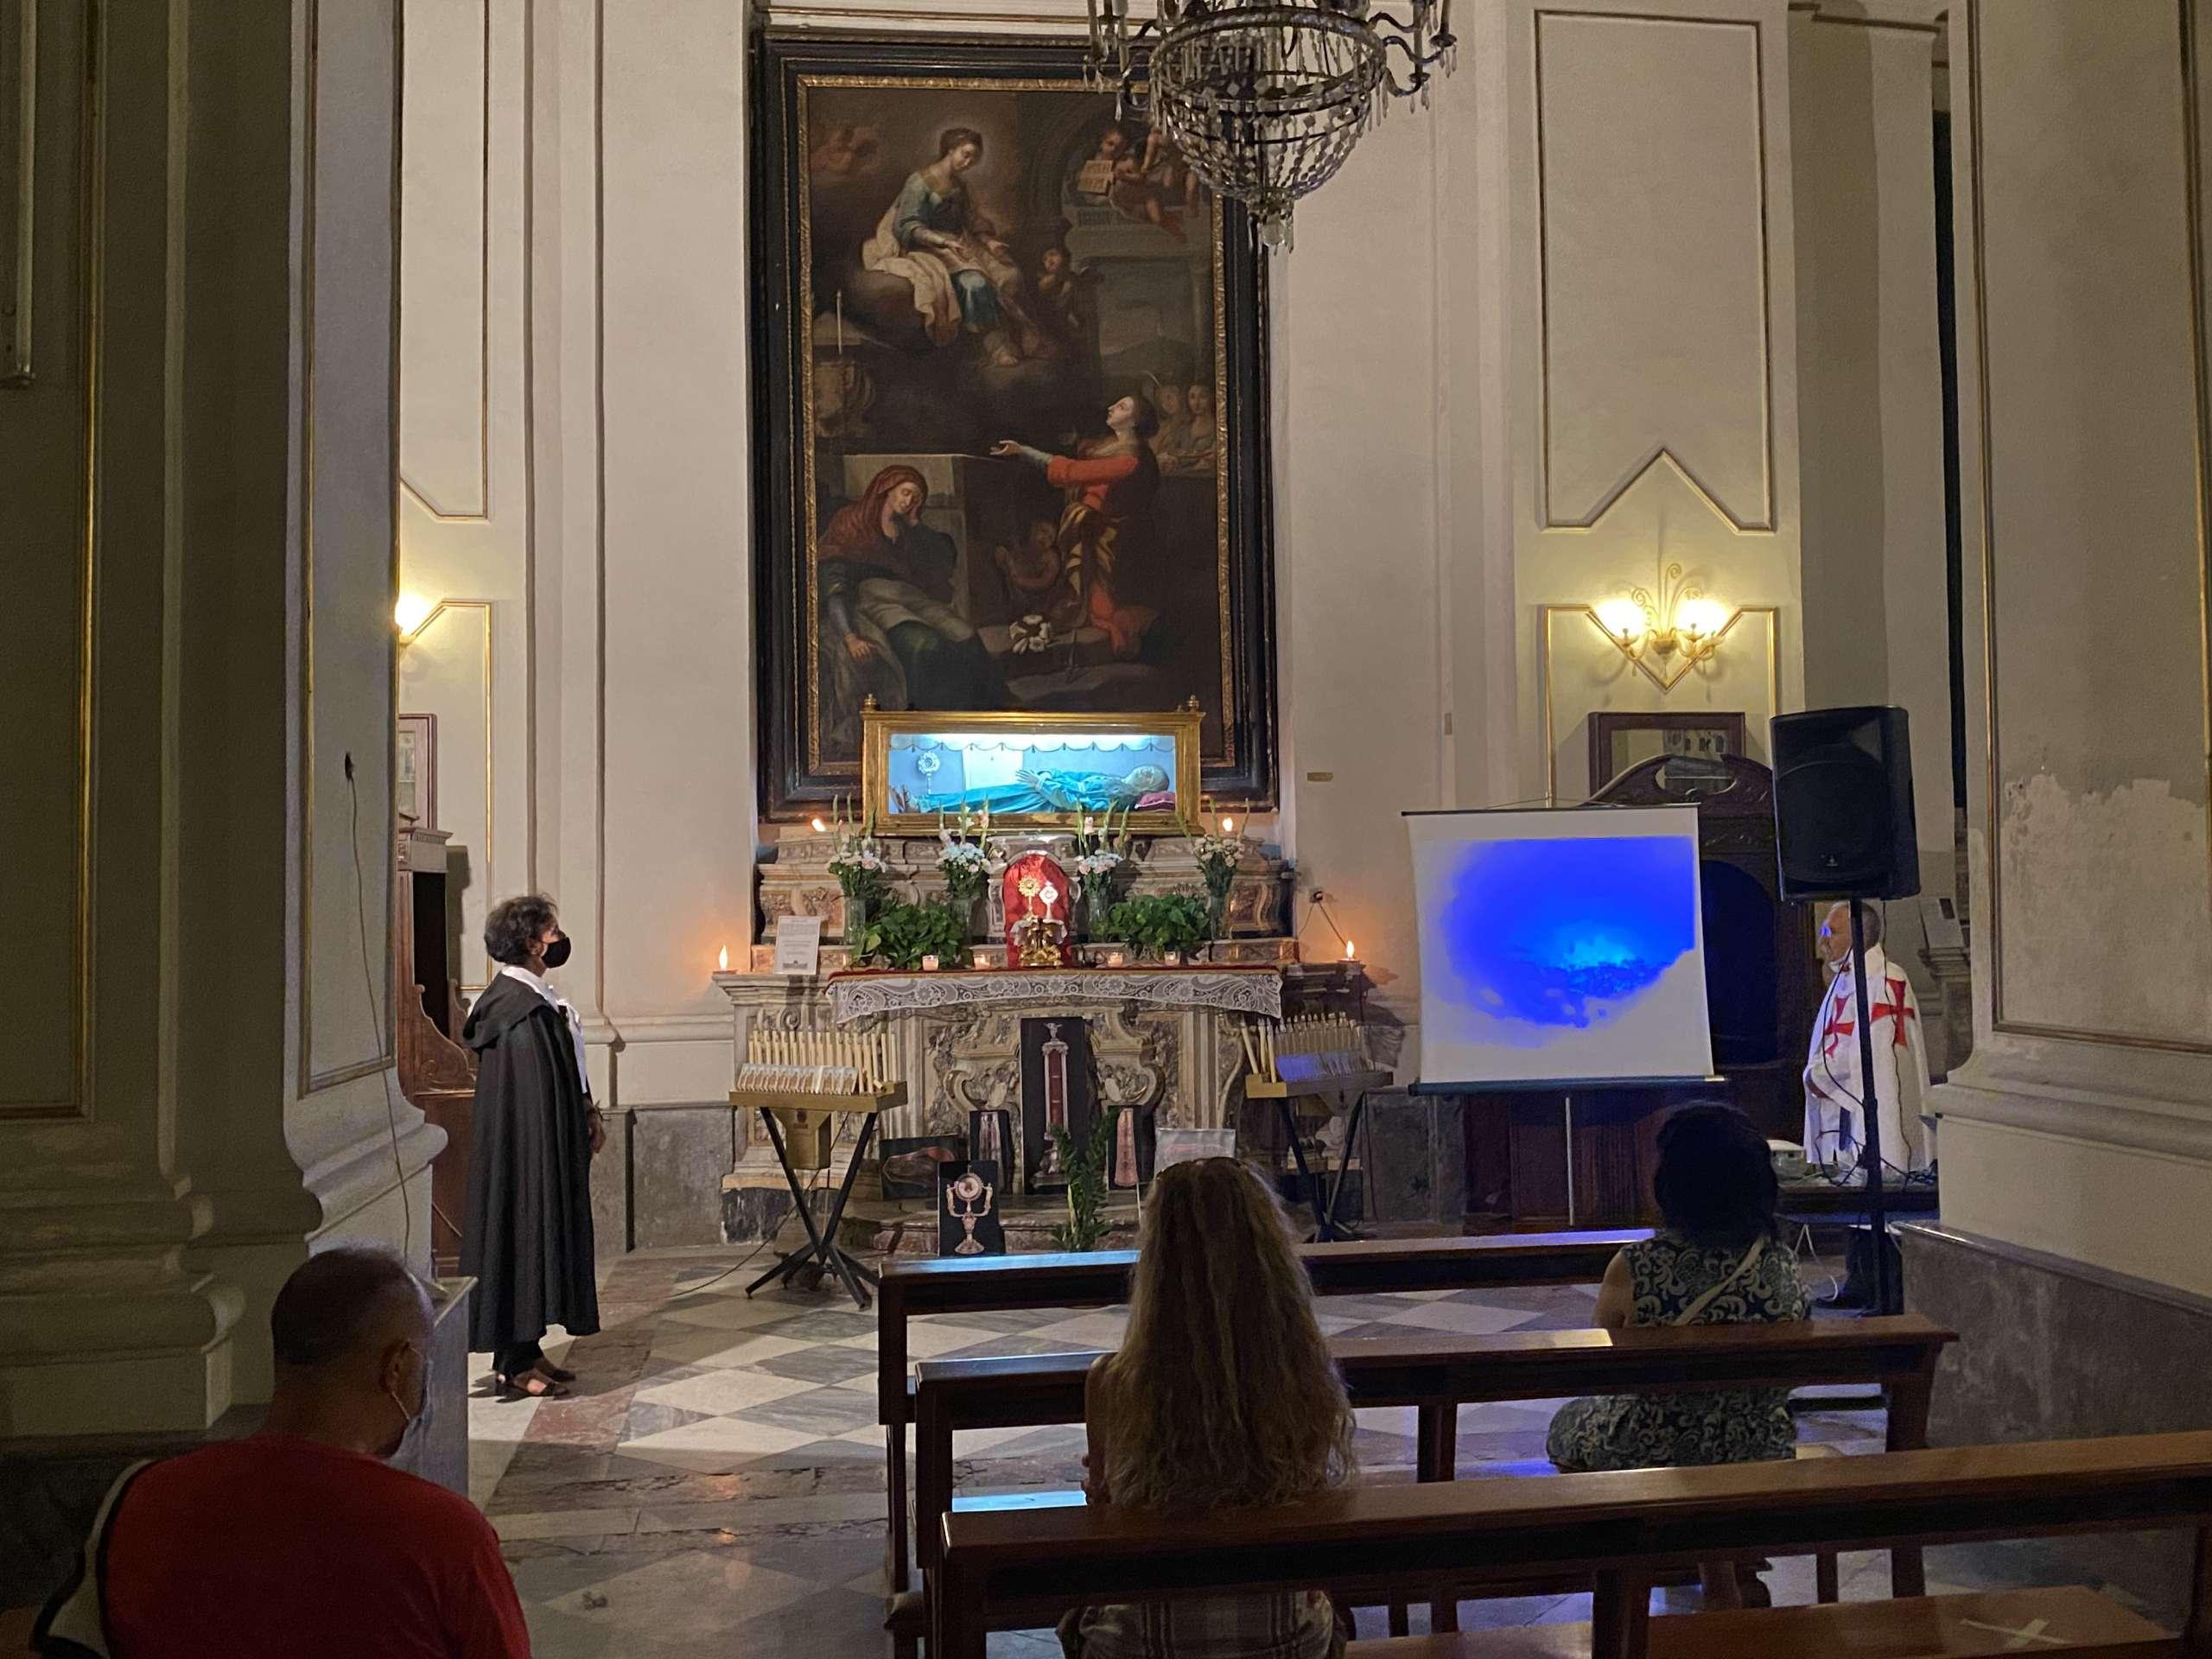 Turno di custodia – Santuario Basilica Maria SS. Annunziata al Carmine – Catania 17.08.2021